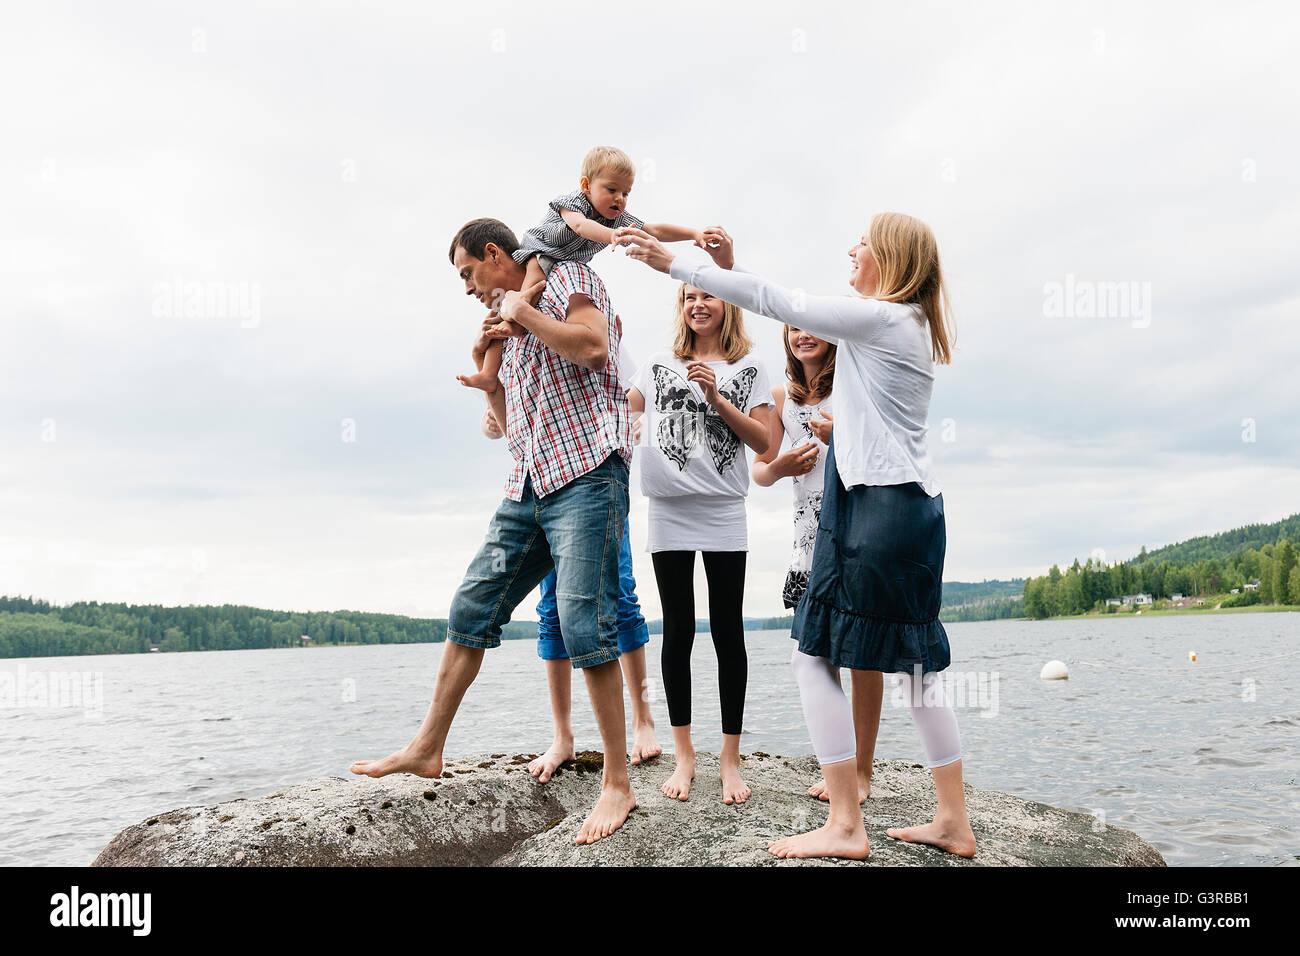 Schweden, Vastmanland, Bergslagen, Hällefors, Nygard, Familie mit vier Kindern auf Felsen Stockbild